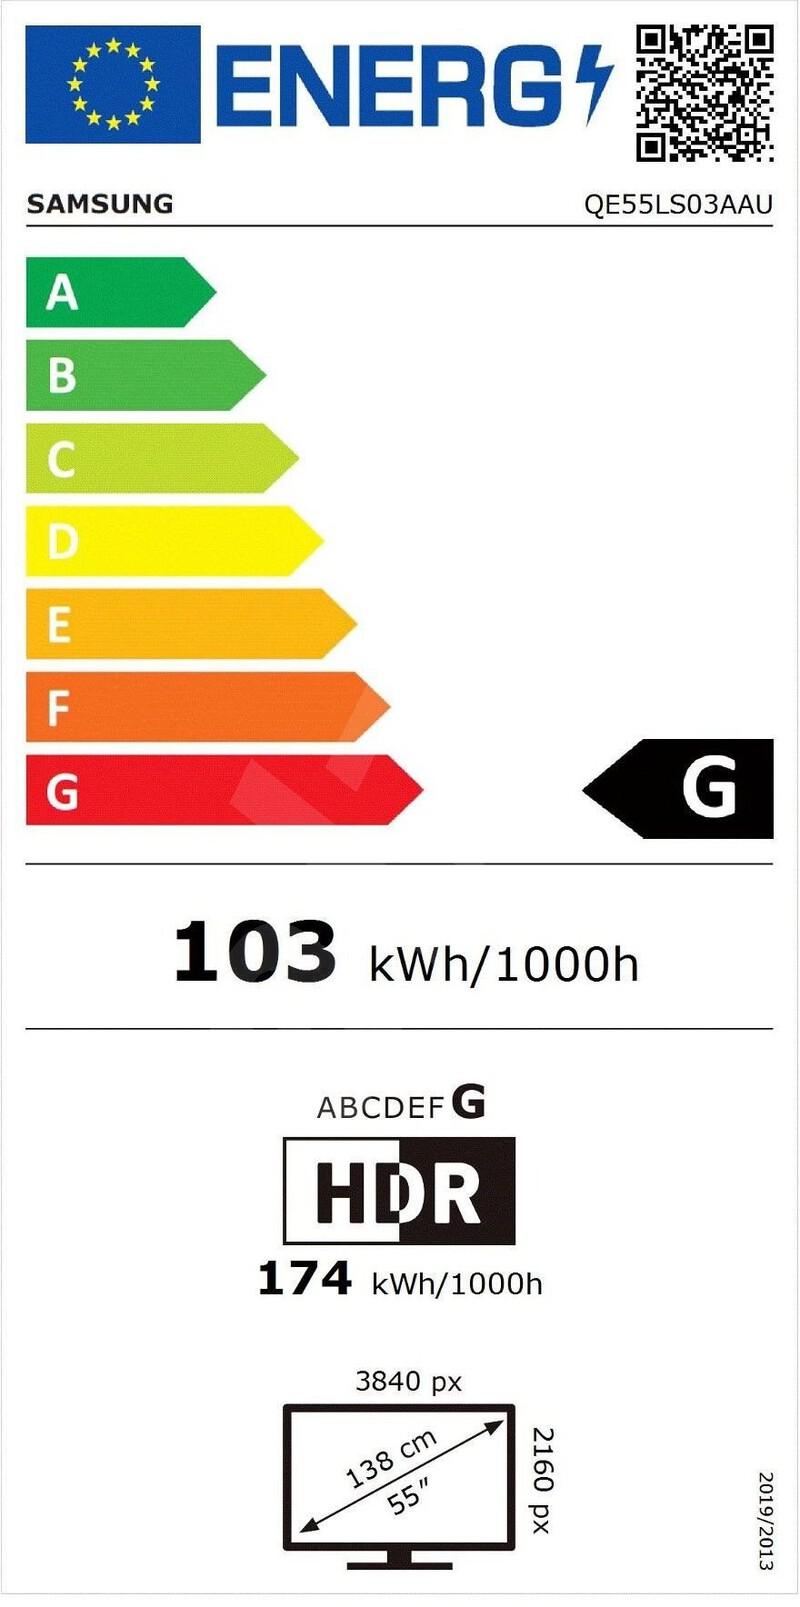 Energetický štítek Samsung QE55LS03A